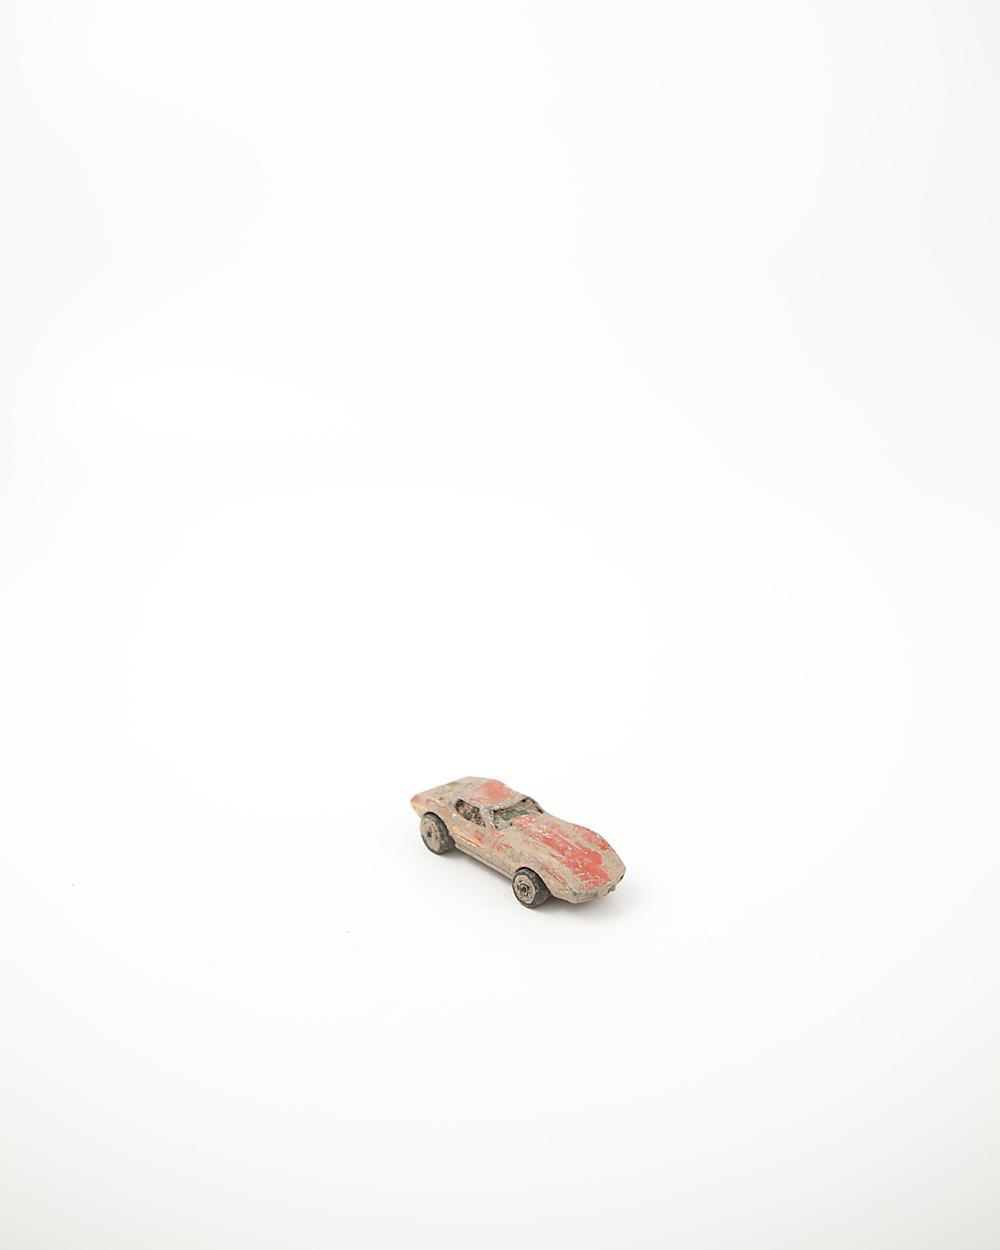 Artifact-Matchbox Car